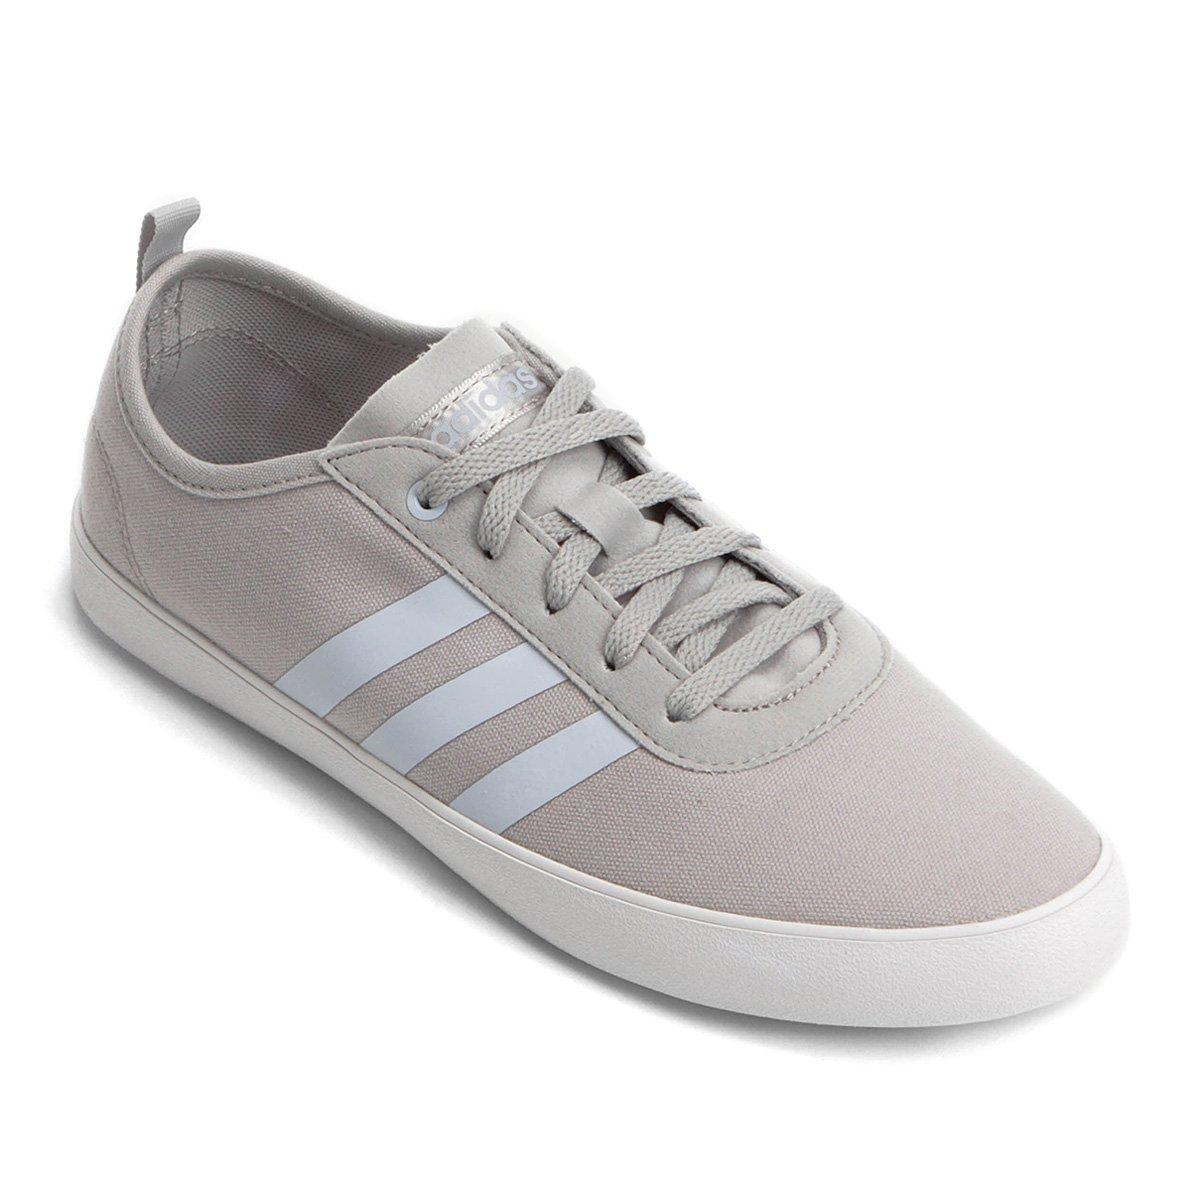 b223002374b Tênis Adidas Qt Vulc 2 Feminino - Compre Agora